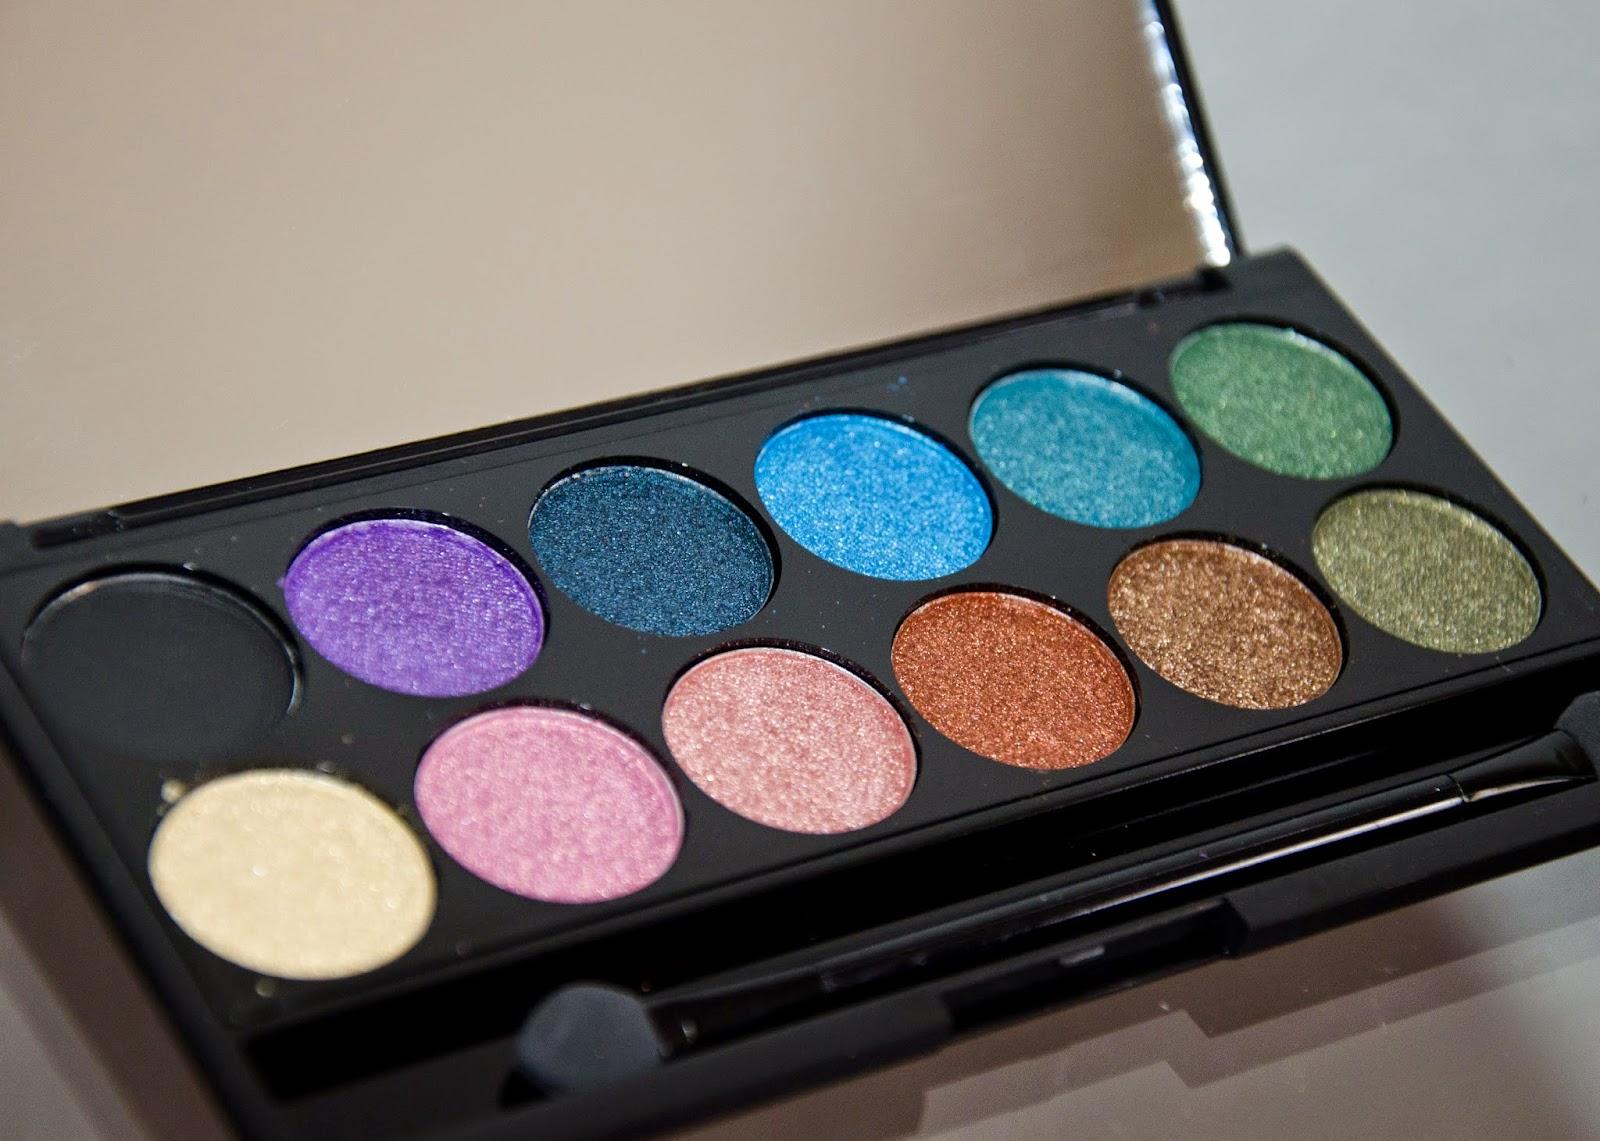 http://blog.gracetakesphotos.com/2014/12/graces-great-gifts-sleek-palettes.html